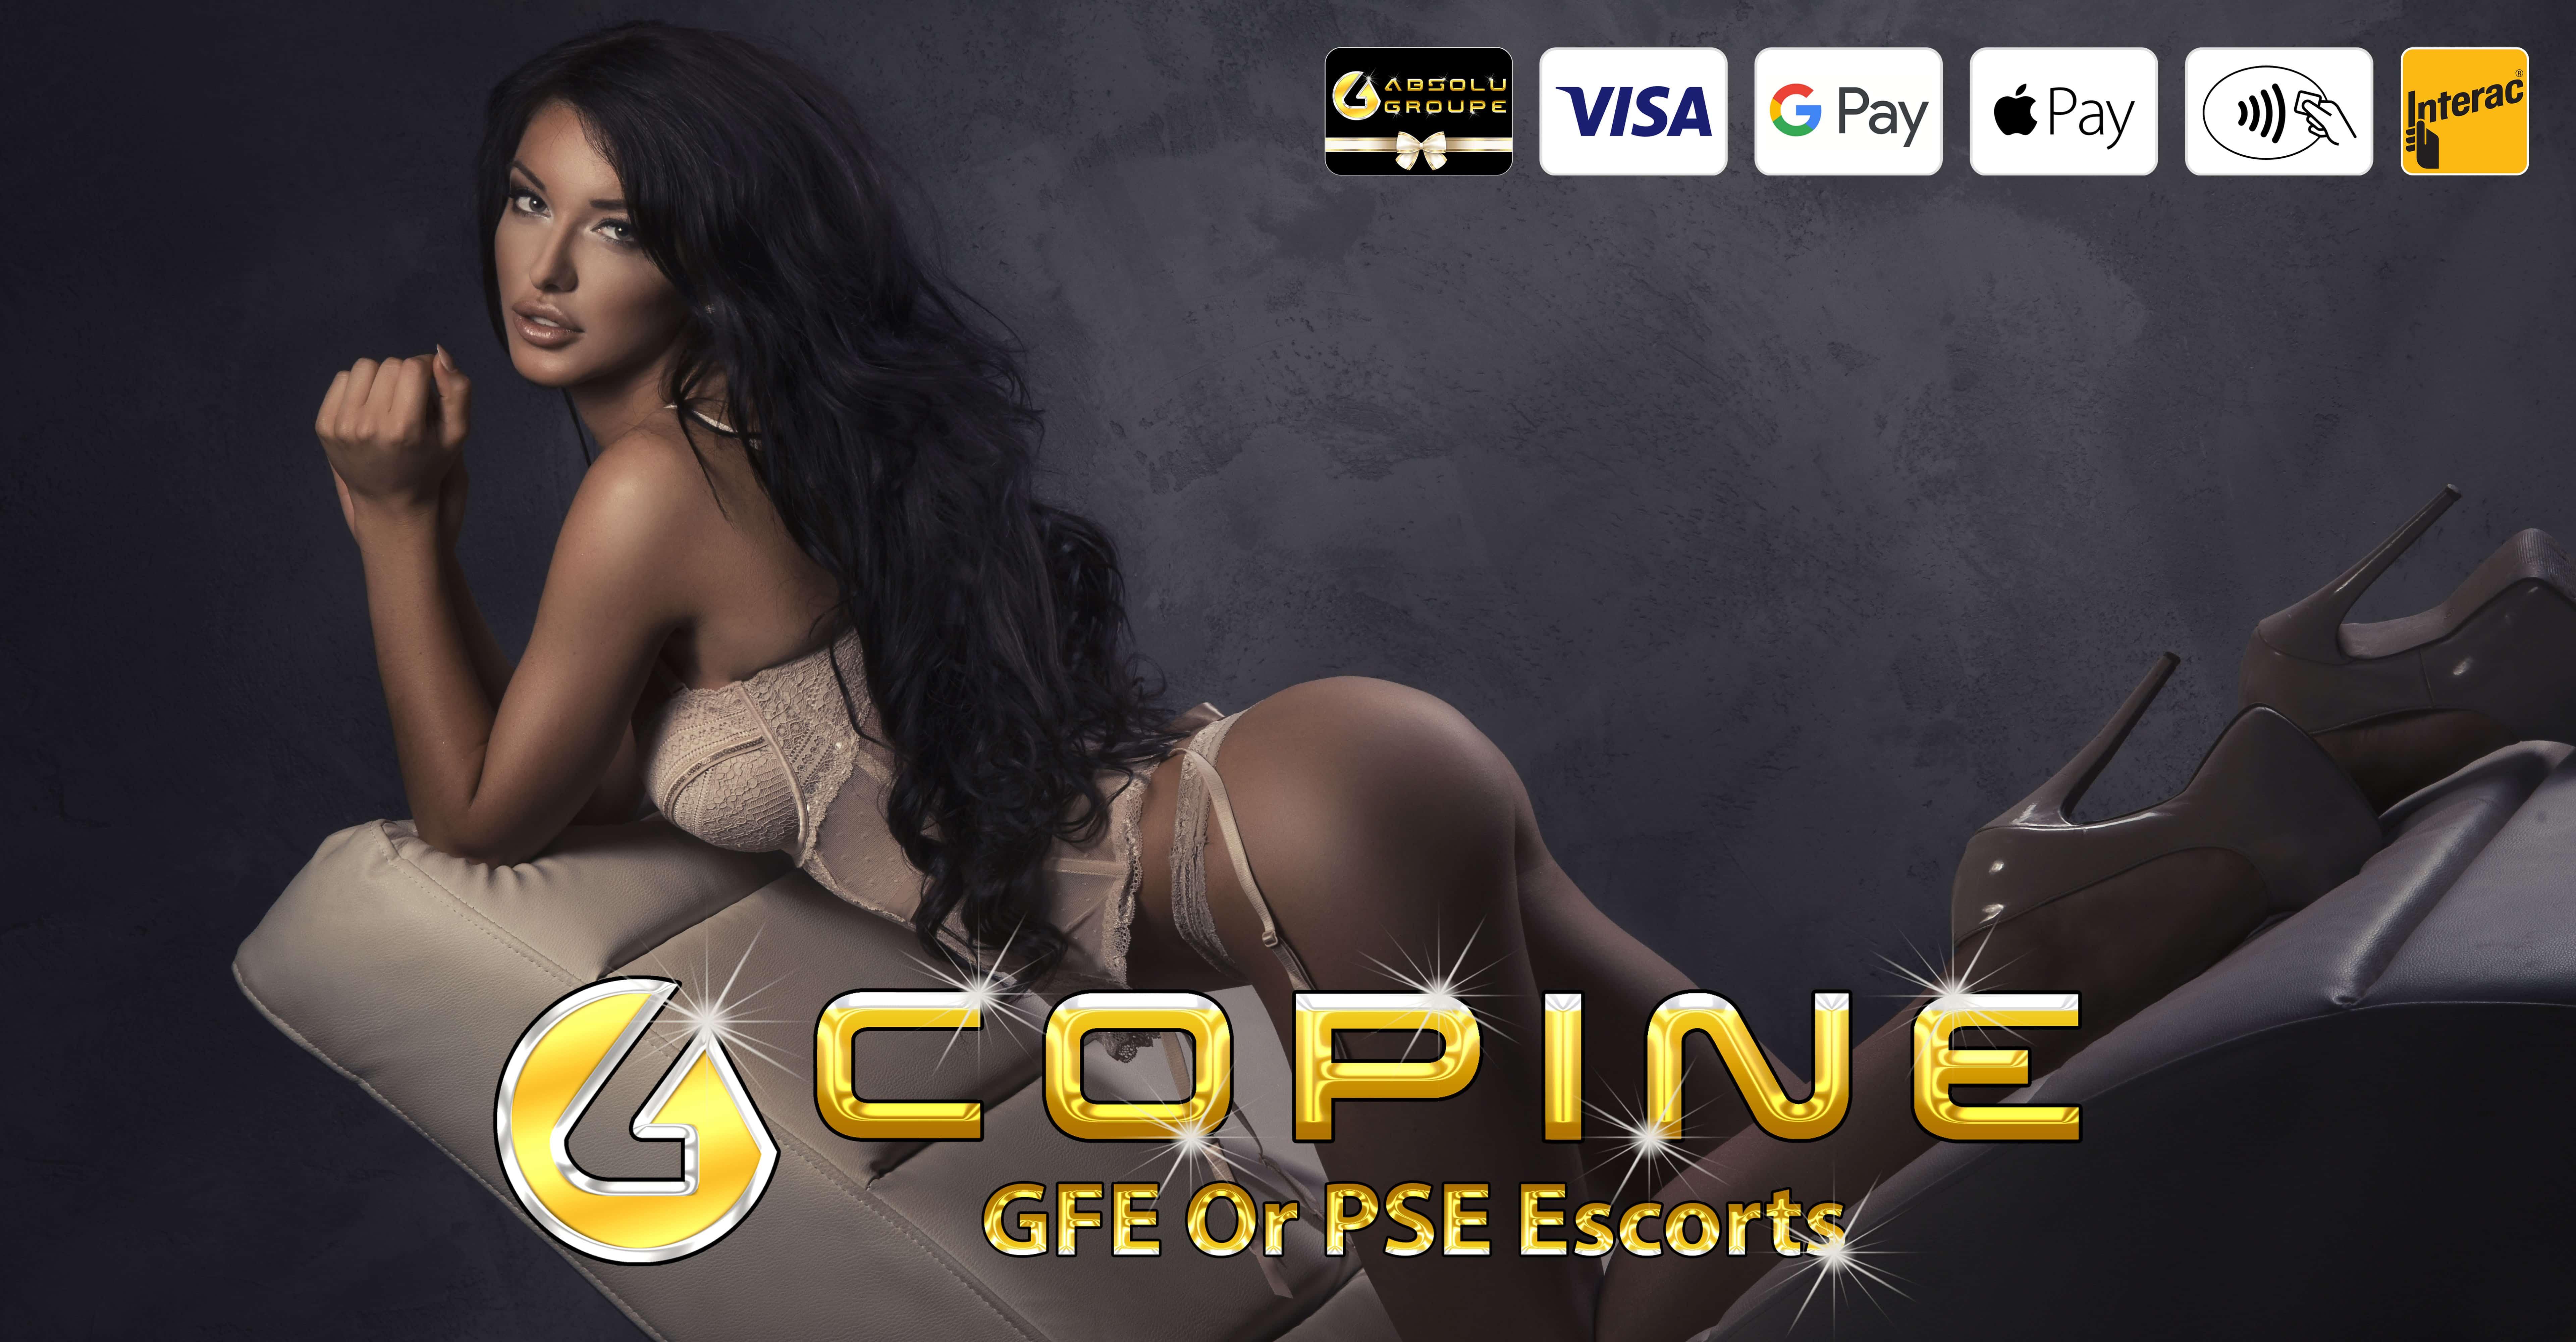 Division-Escorts-GFE-PSE-VIP-Elite-Absolu-Copine-Montreal-EN-8K